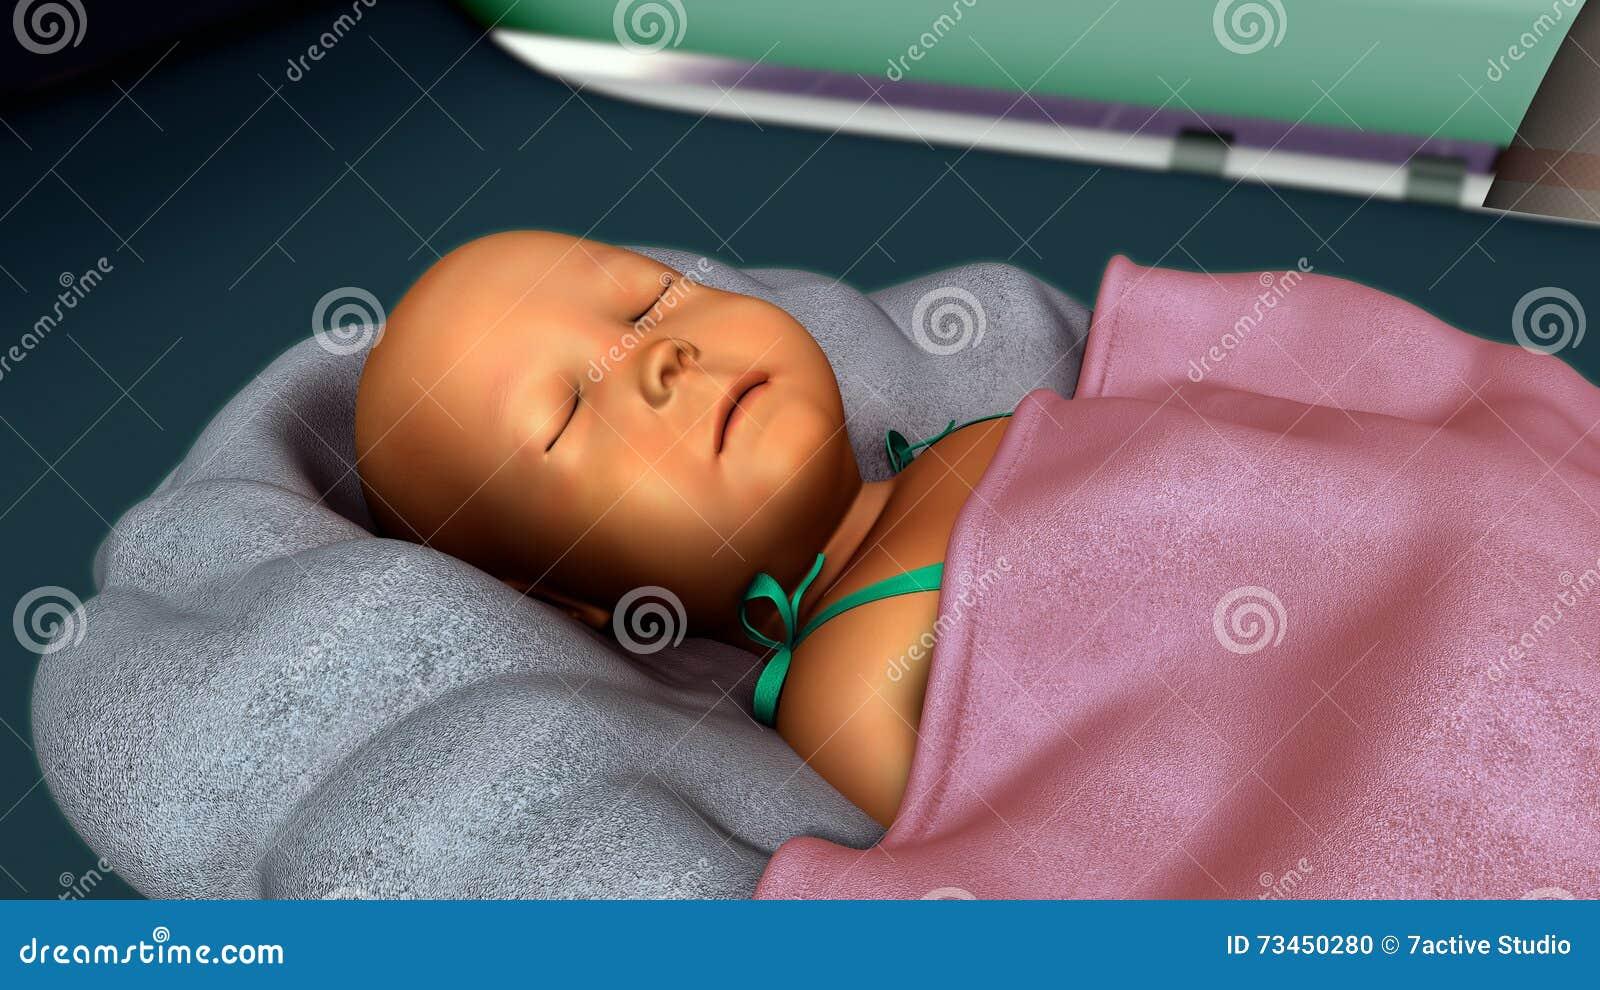 Jaundice in new born stock photo. Image of born, jaundice ...